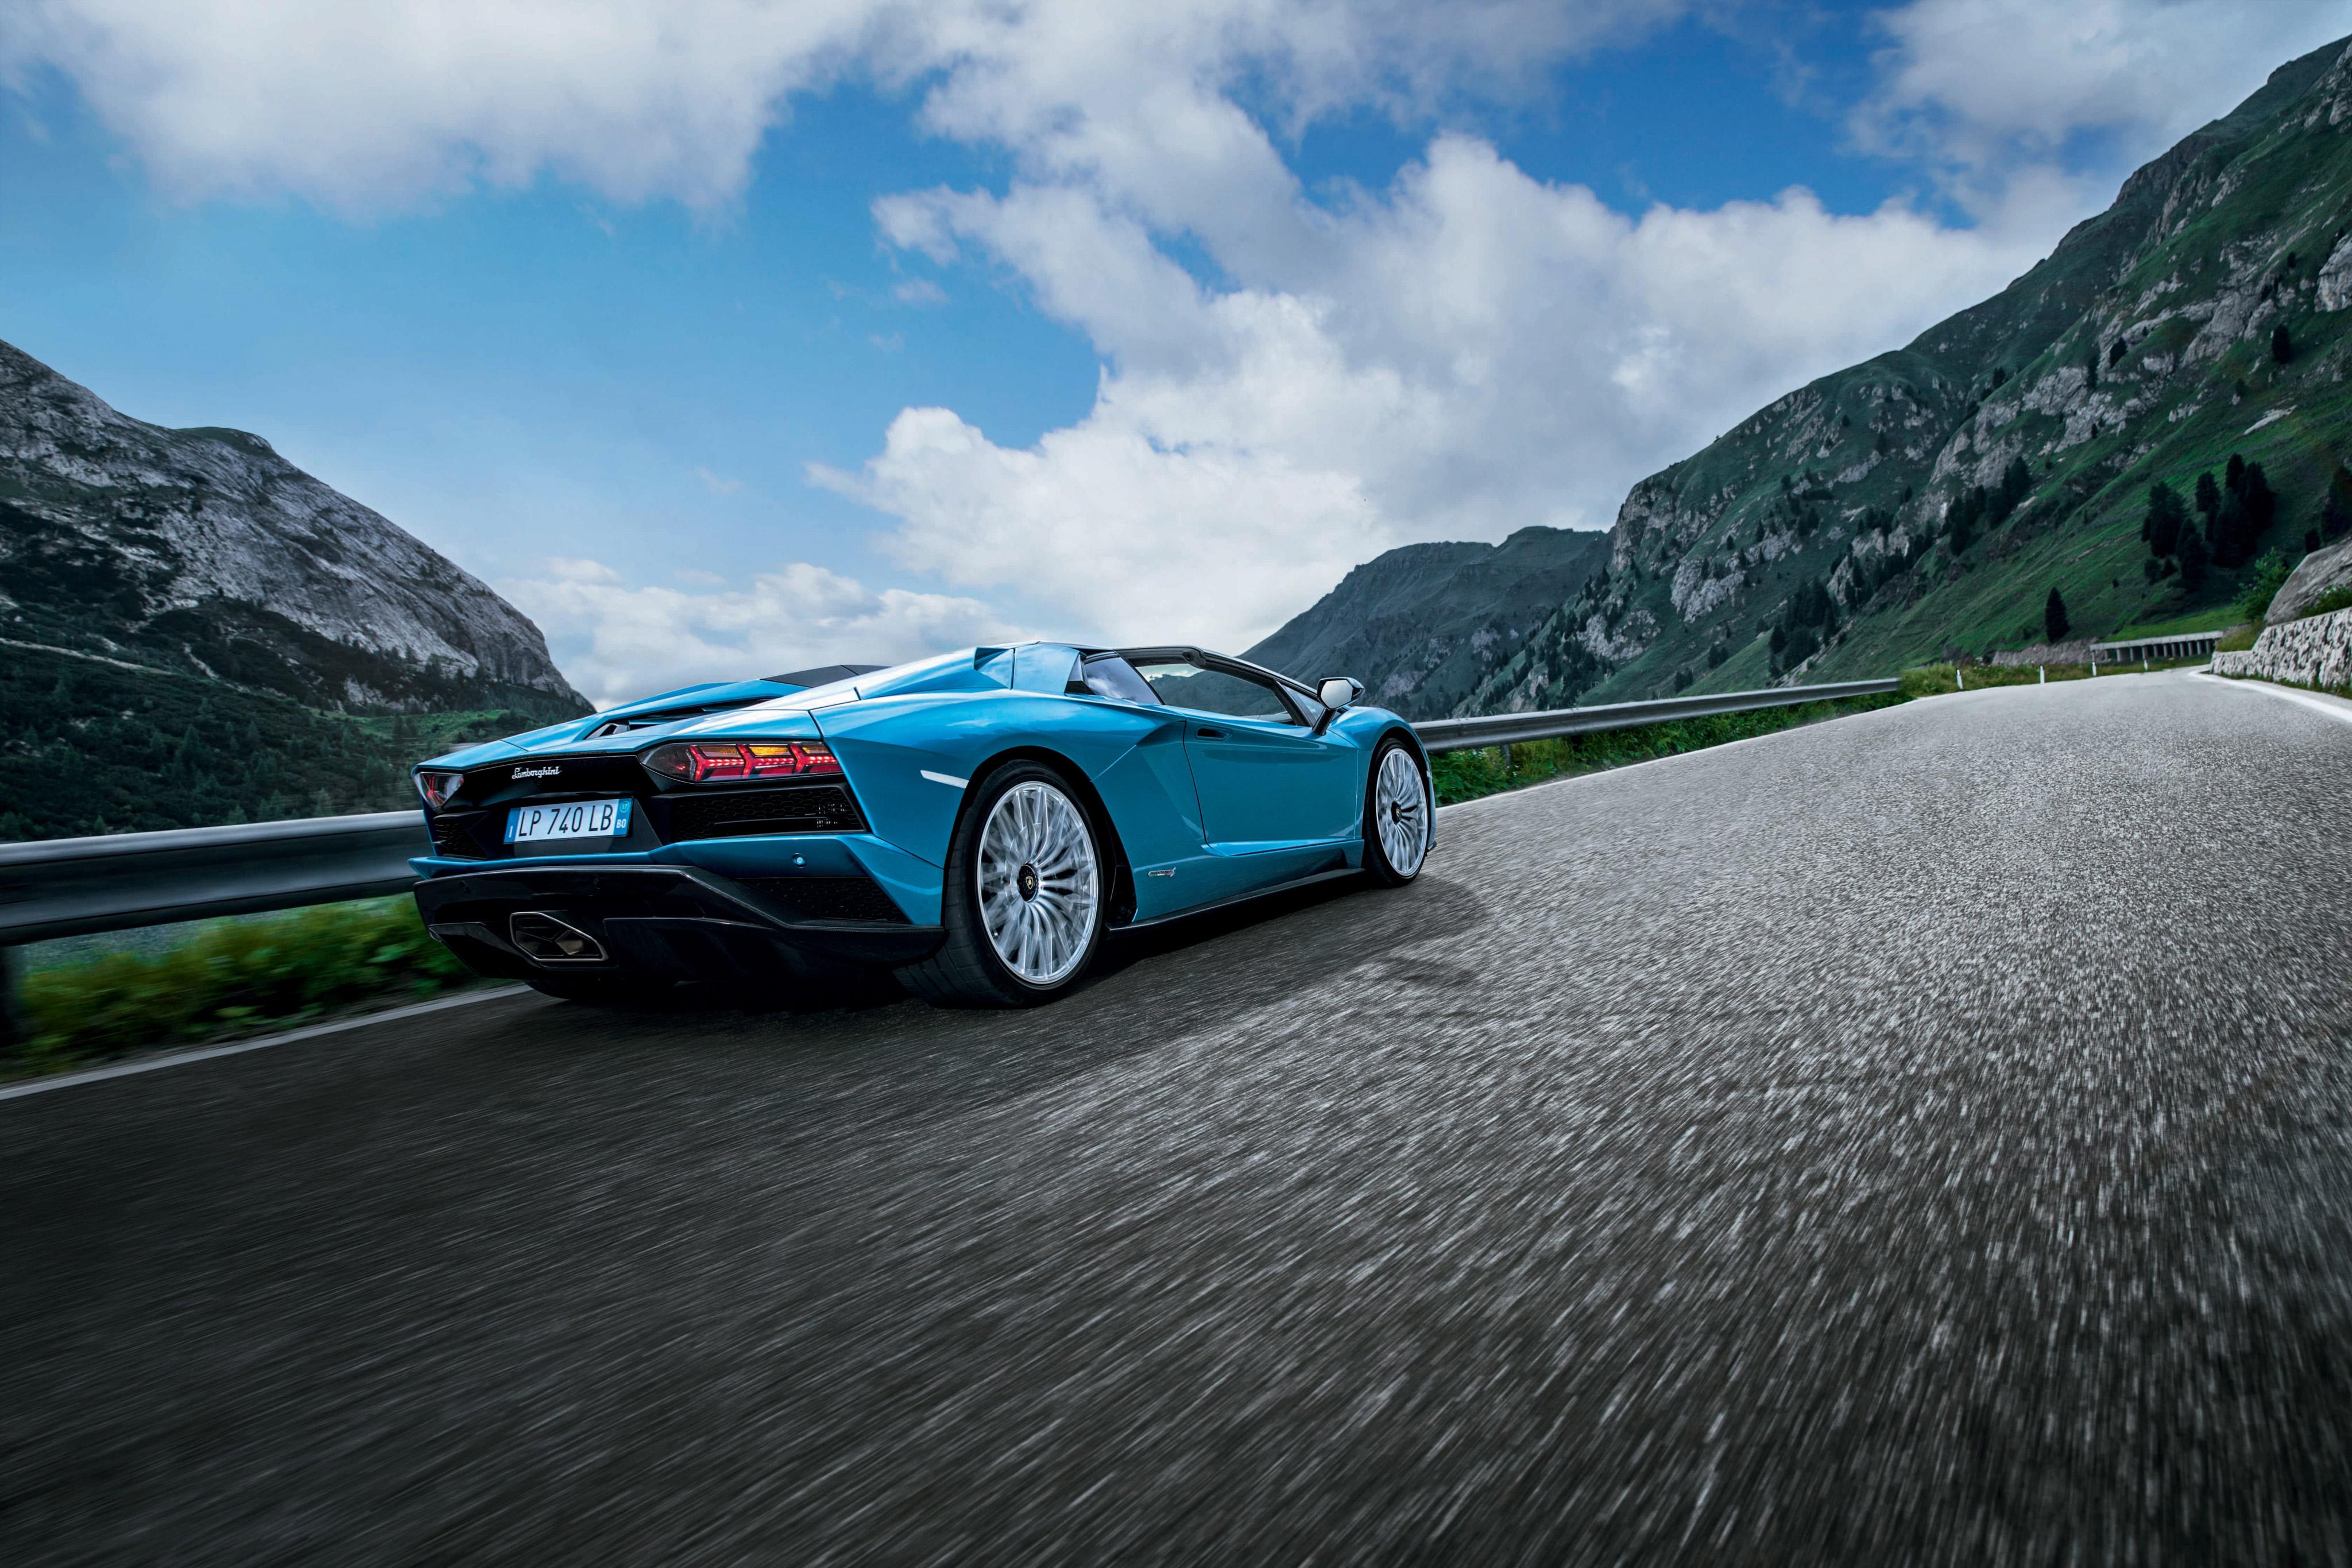 Lamborghini Aventador S Roadster 2017 4k, HD Cars, 4k ...